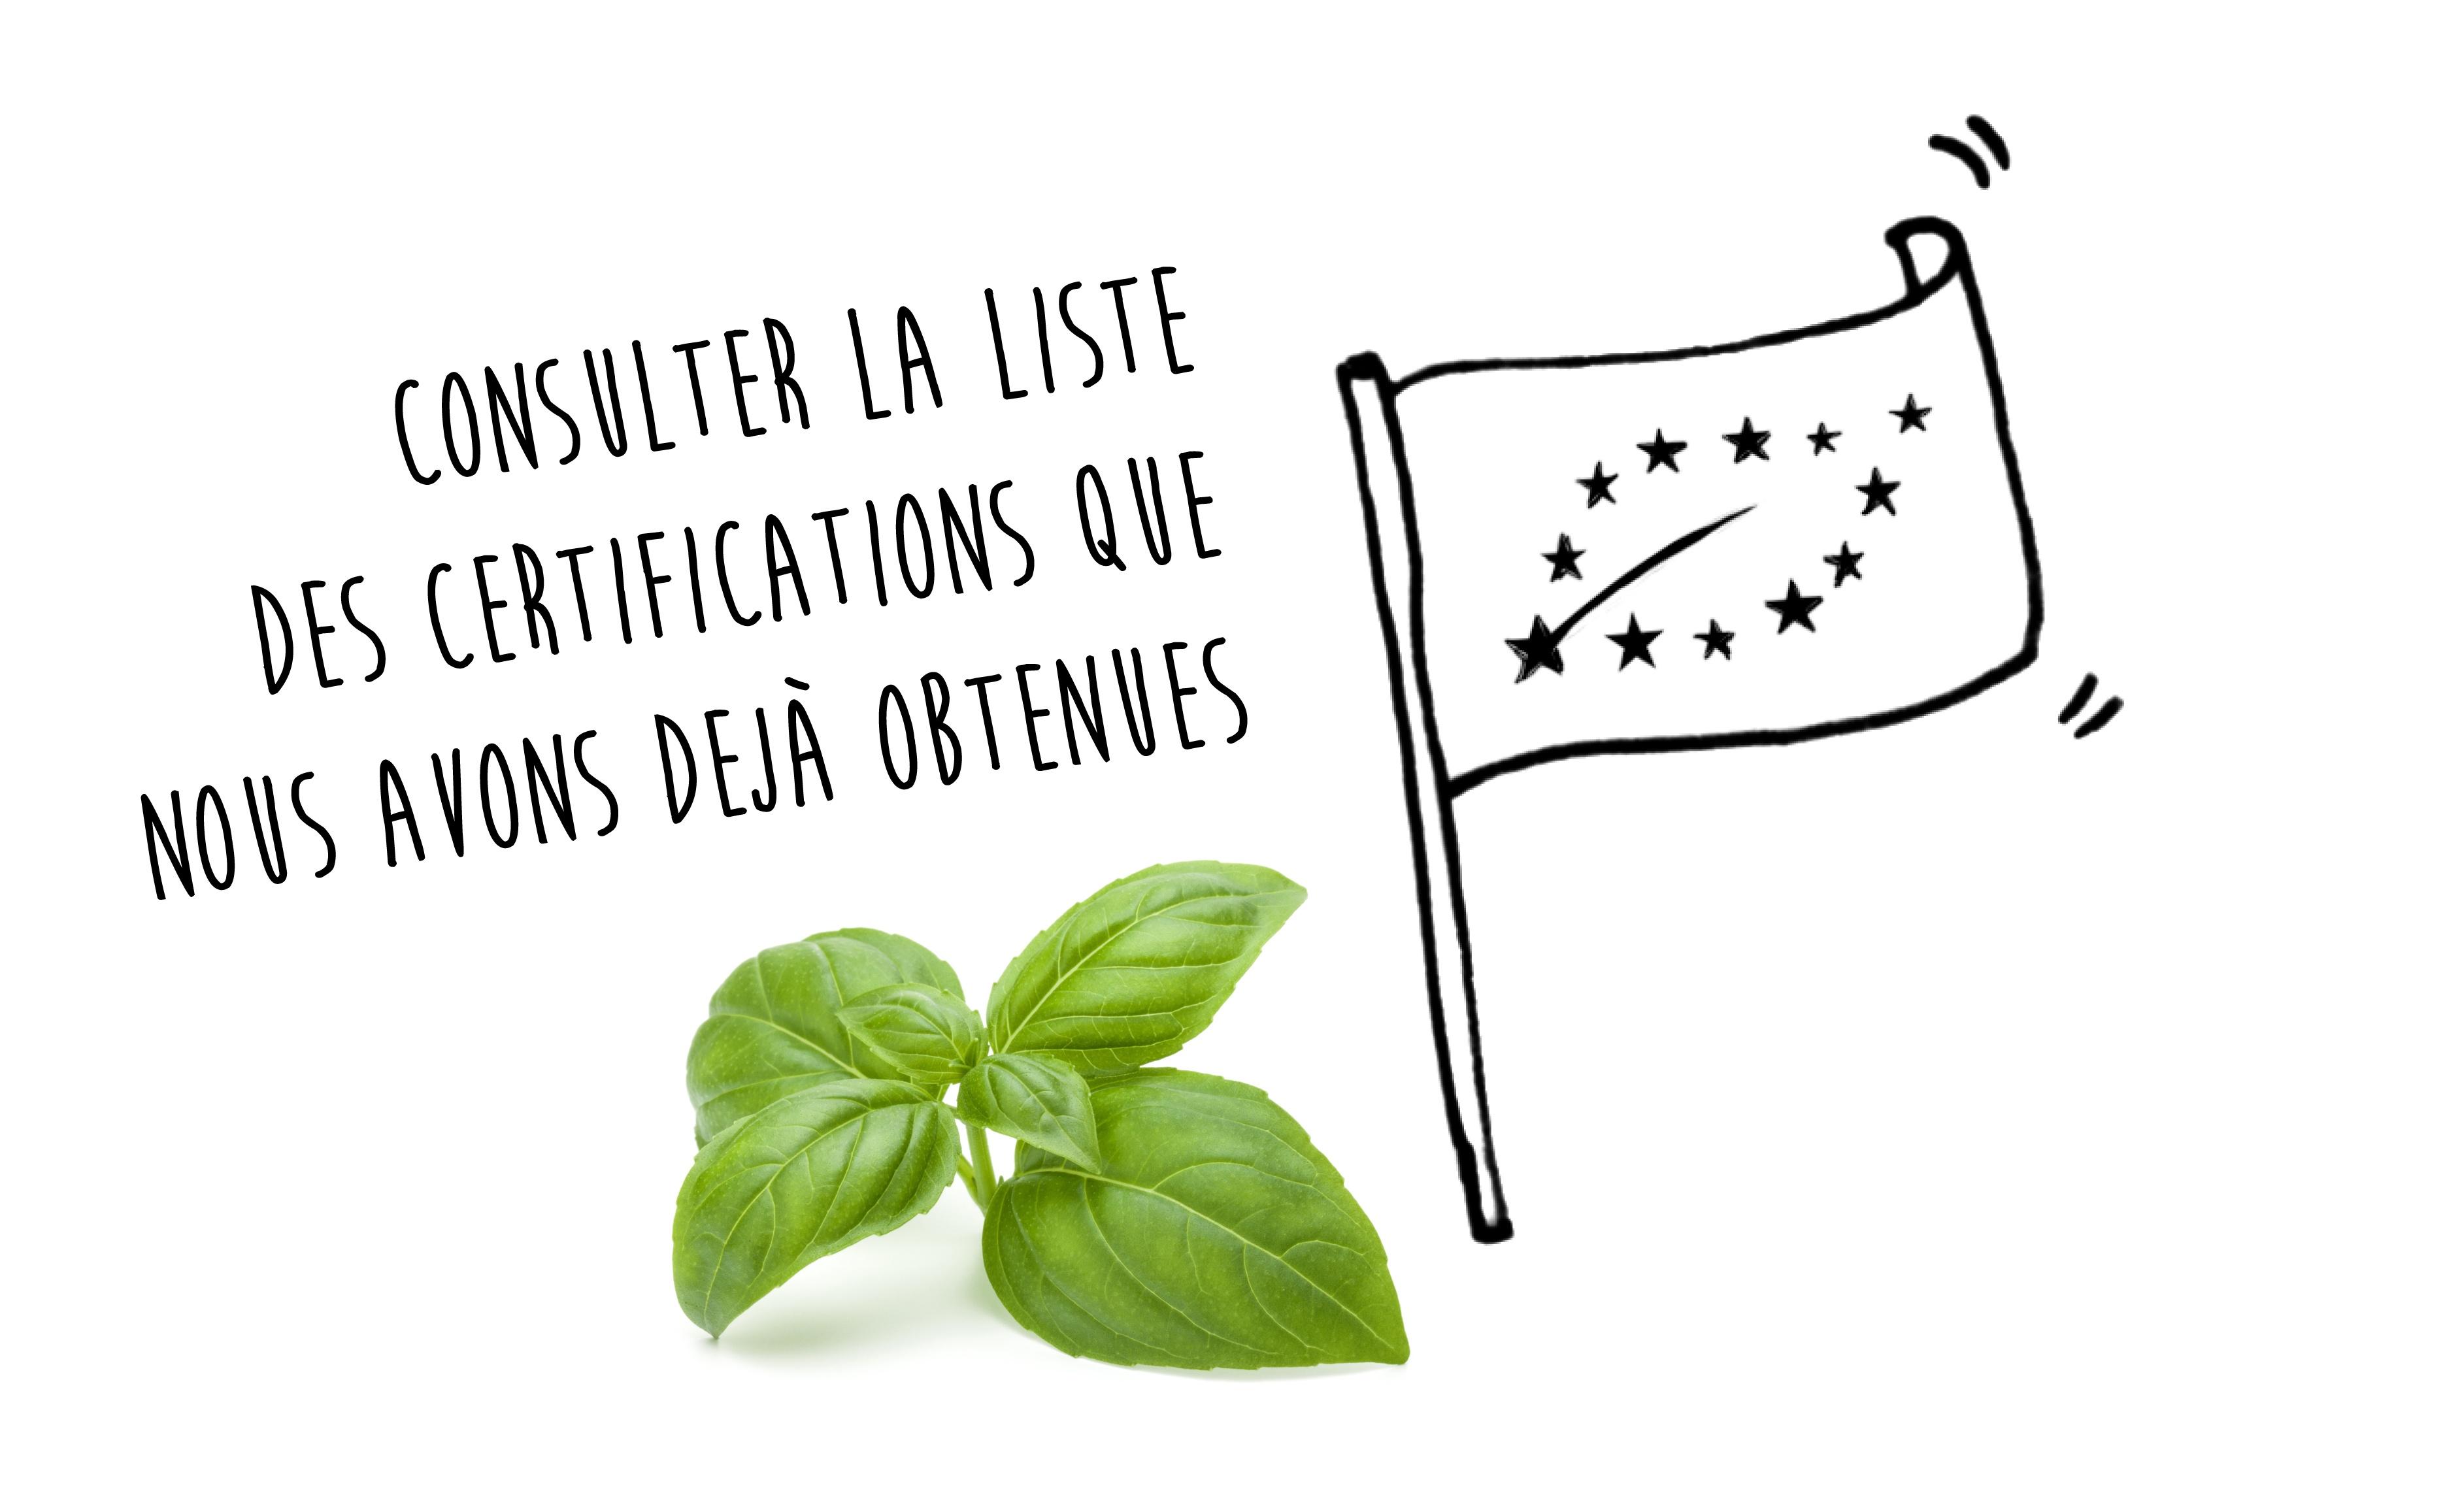 elenco-certificazioni.jpg